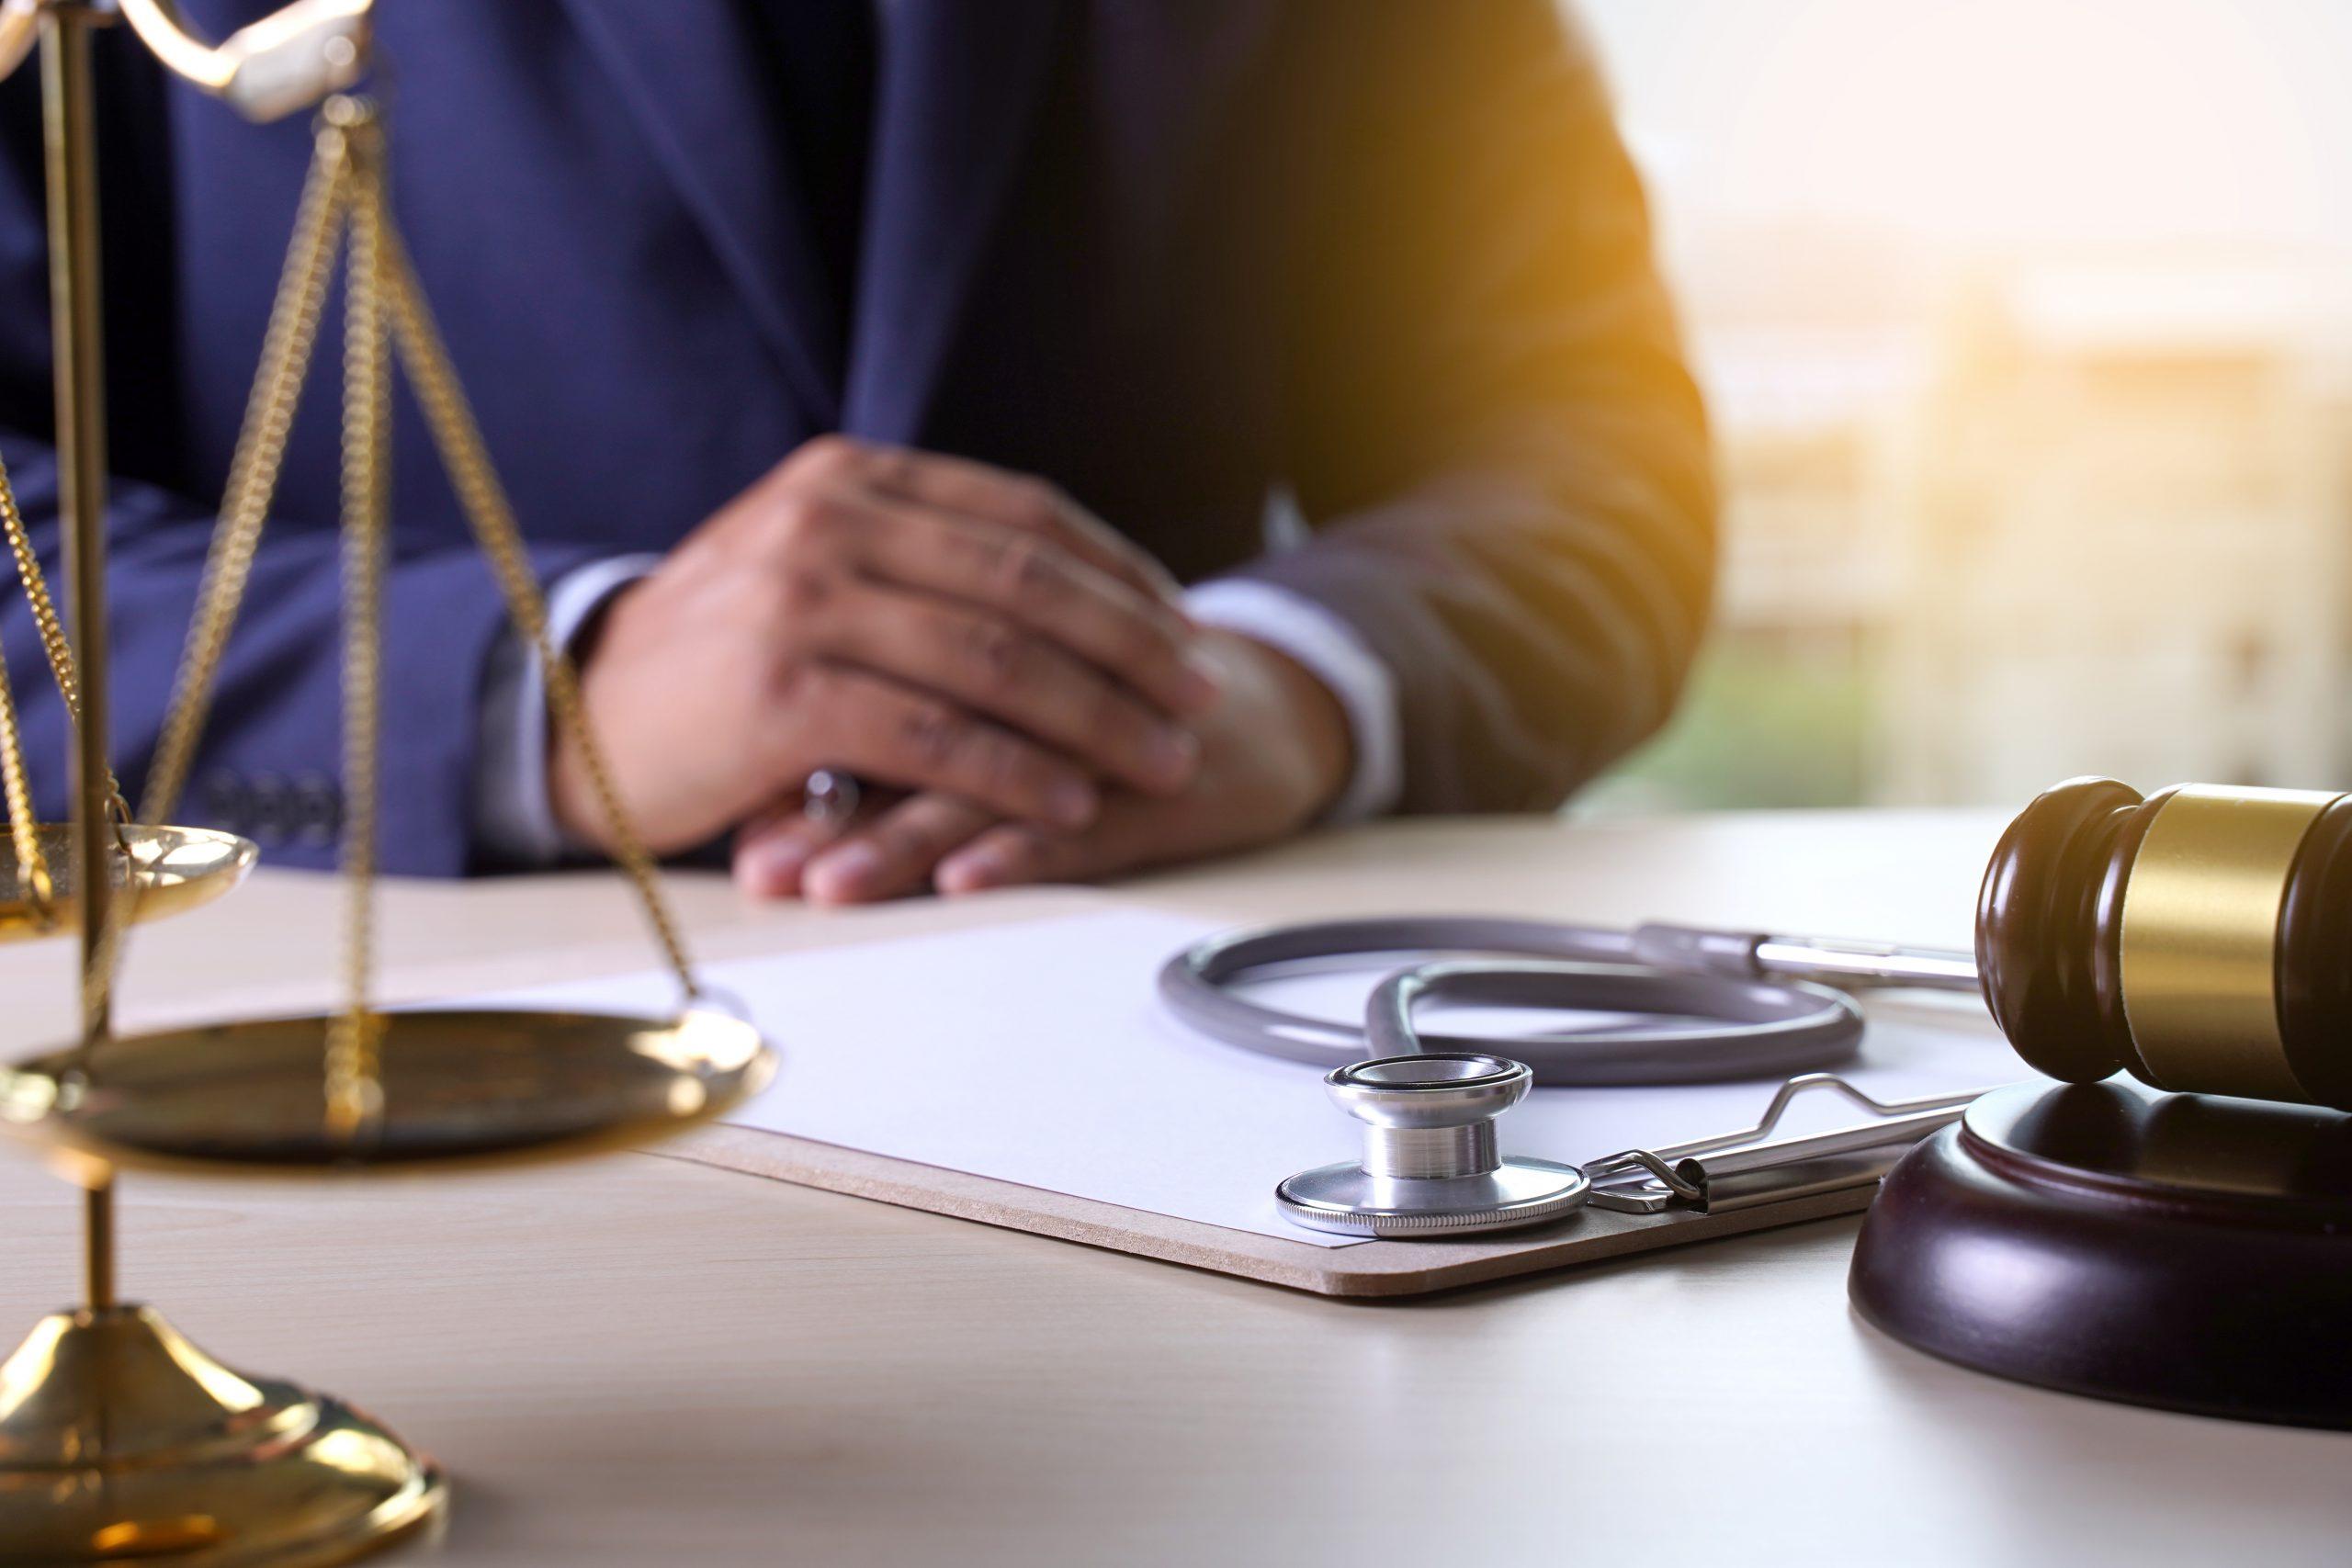 Legislation May Impact the Medicare Member Experience